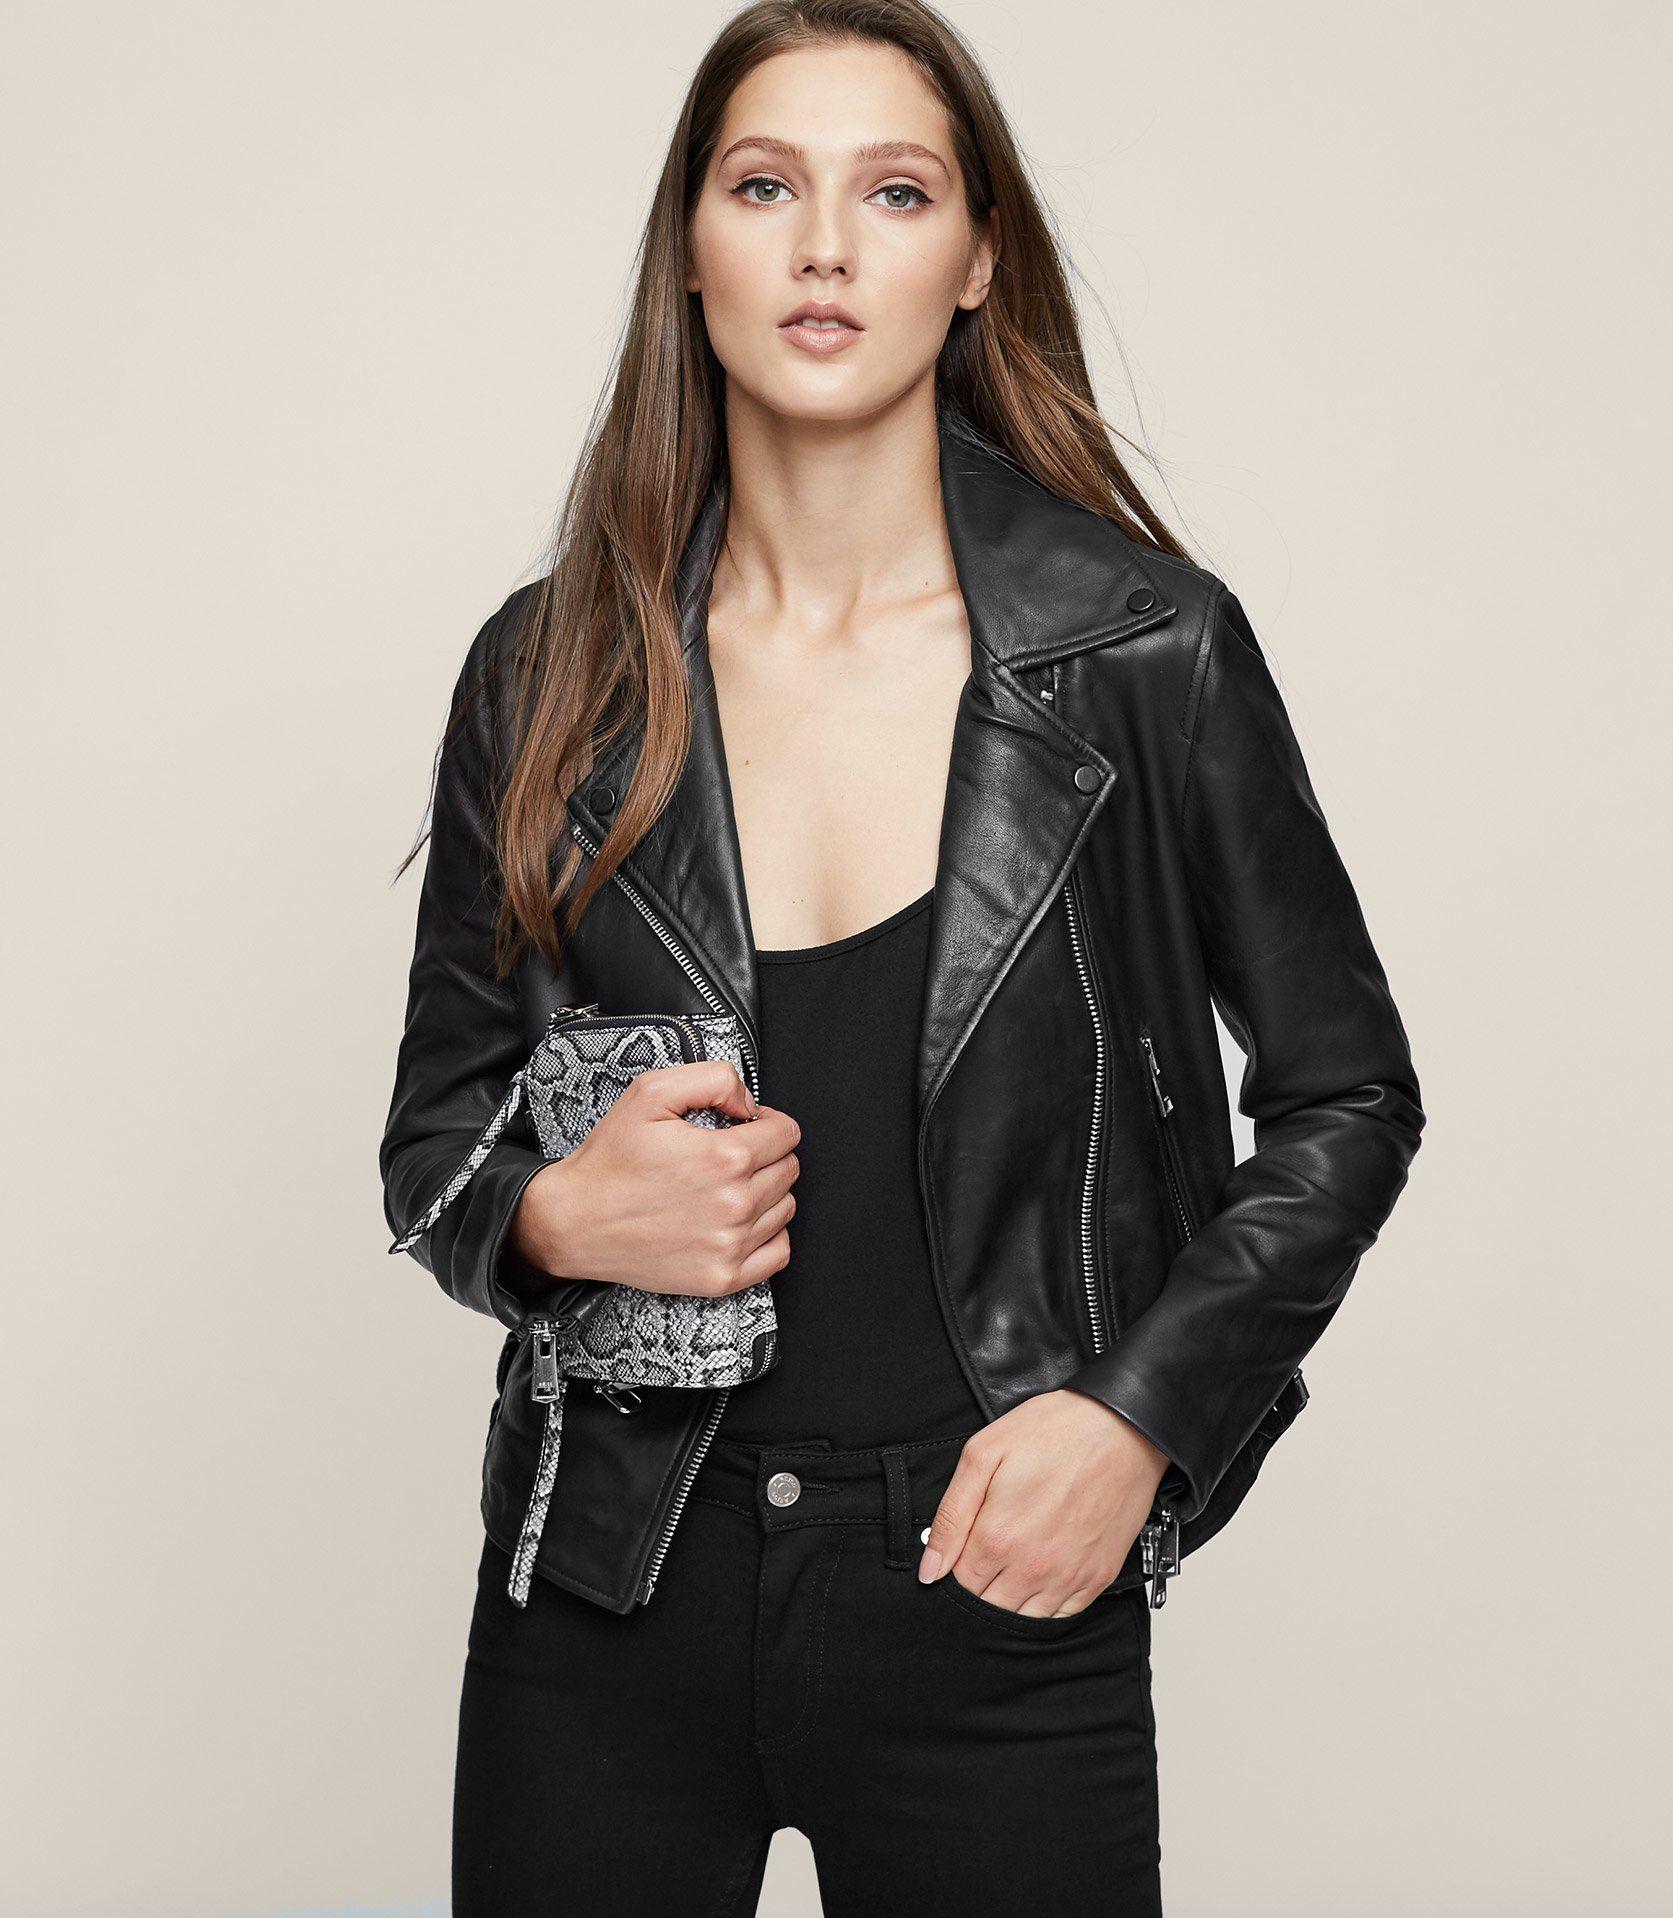 Reiss Ally Leather Biker Jacket Trendy Fashion Outfits Trendy Outfits Inspiration Leather Jacket Girl [ 1918 x 1673 Pixel ]